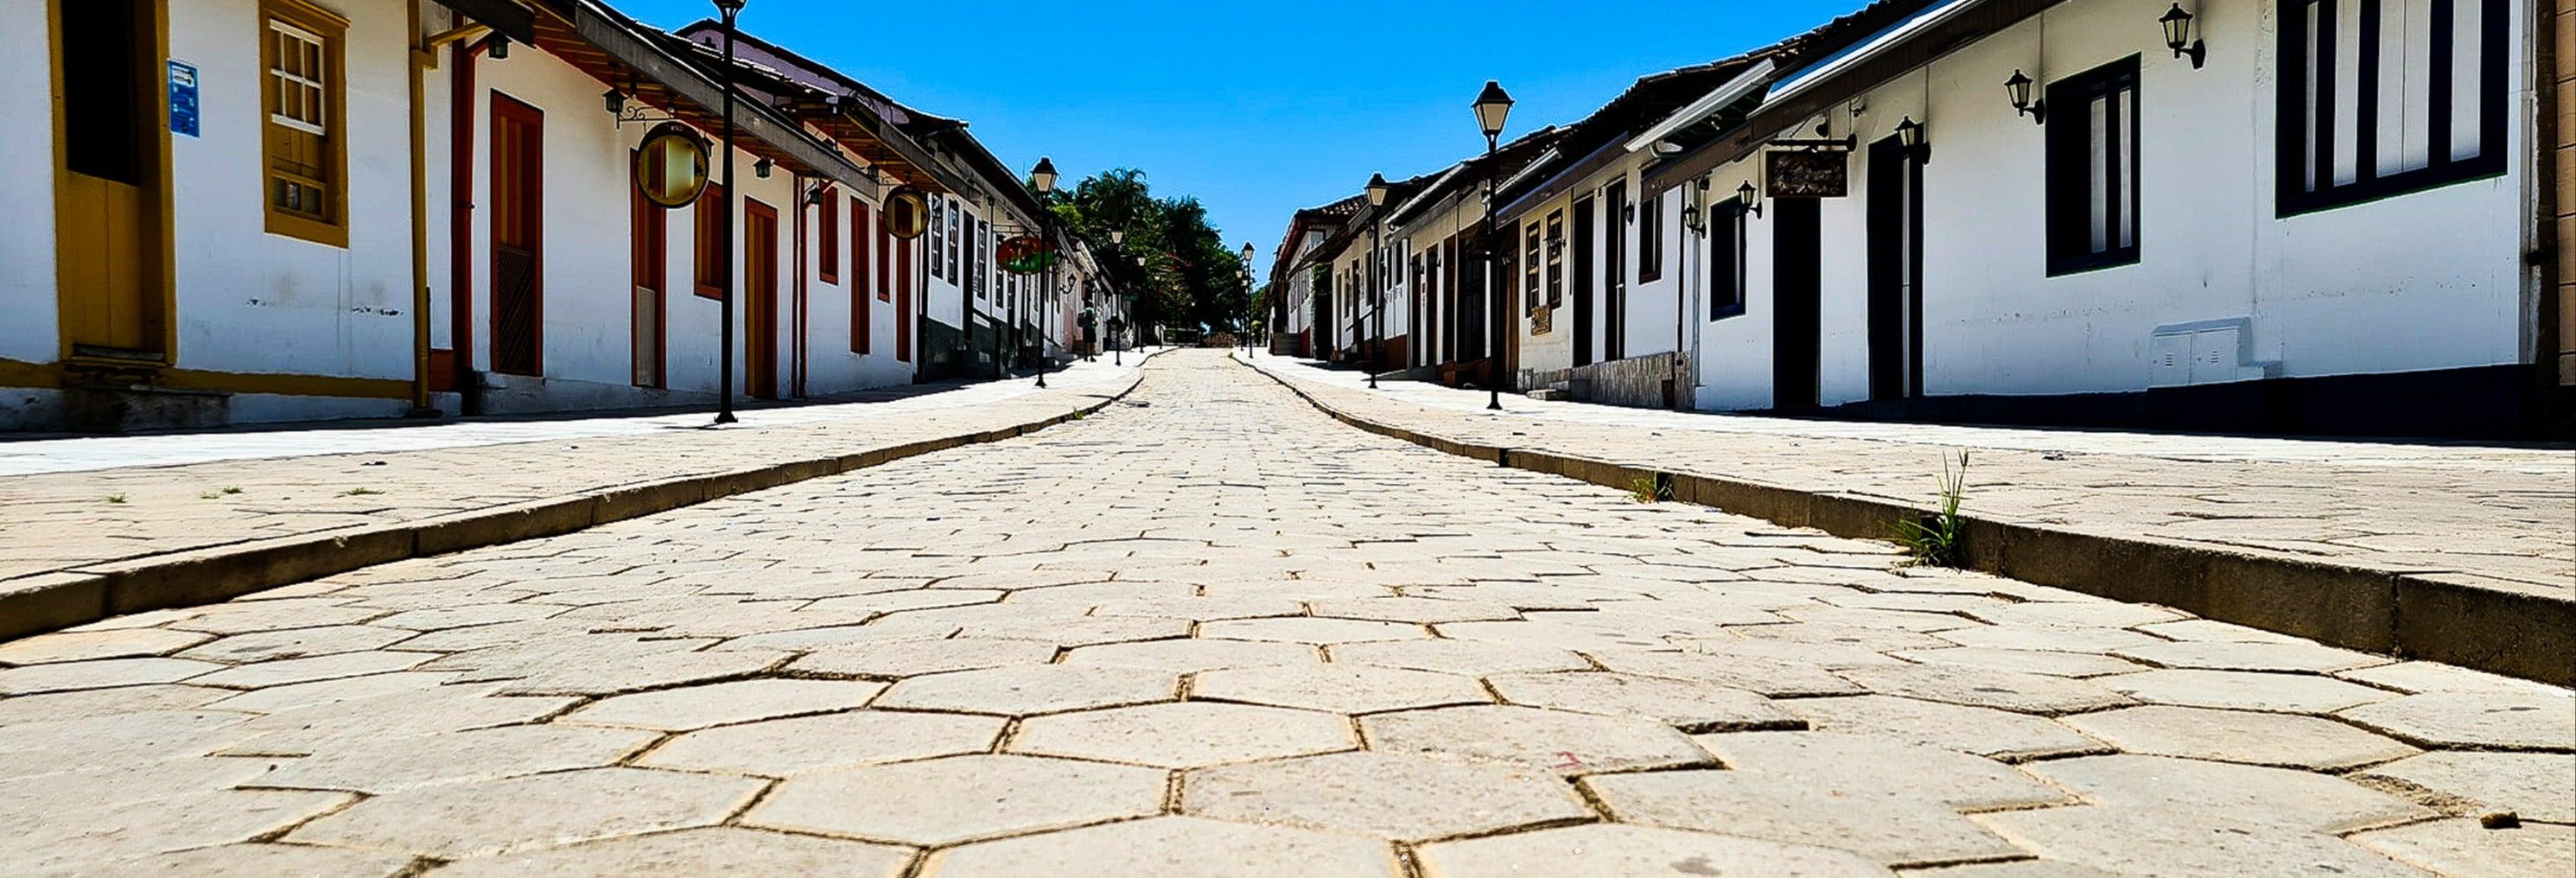 Excursão privada a Pirenópolis e ao Salto do Corumbá